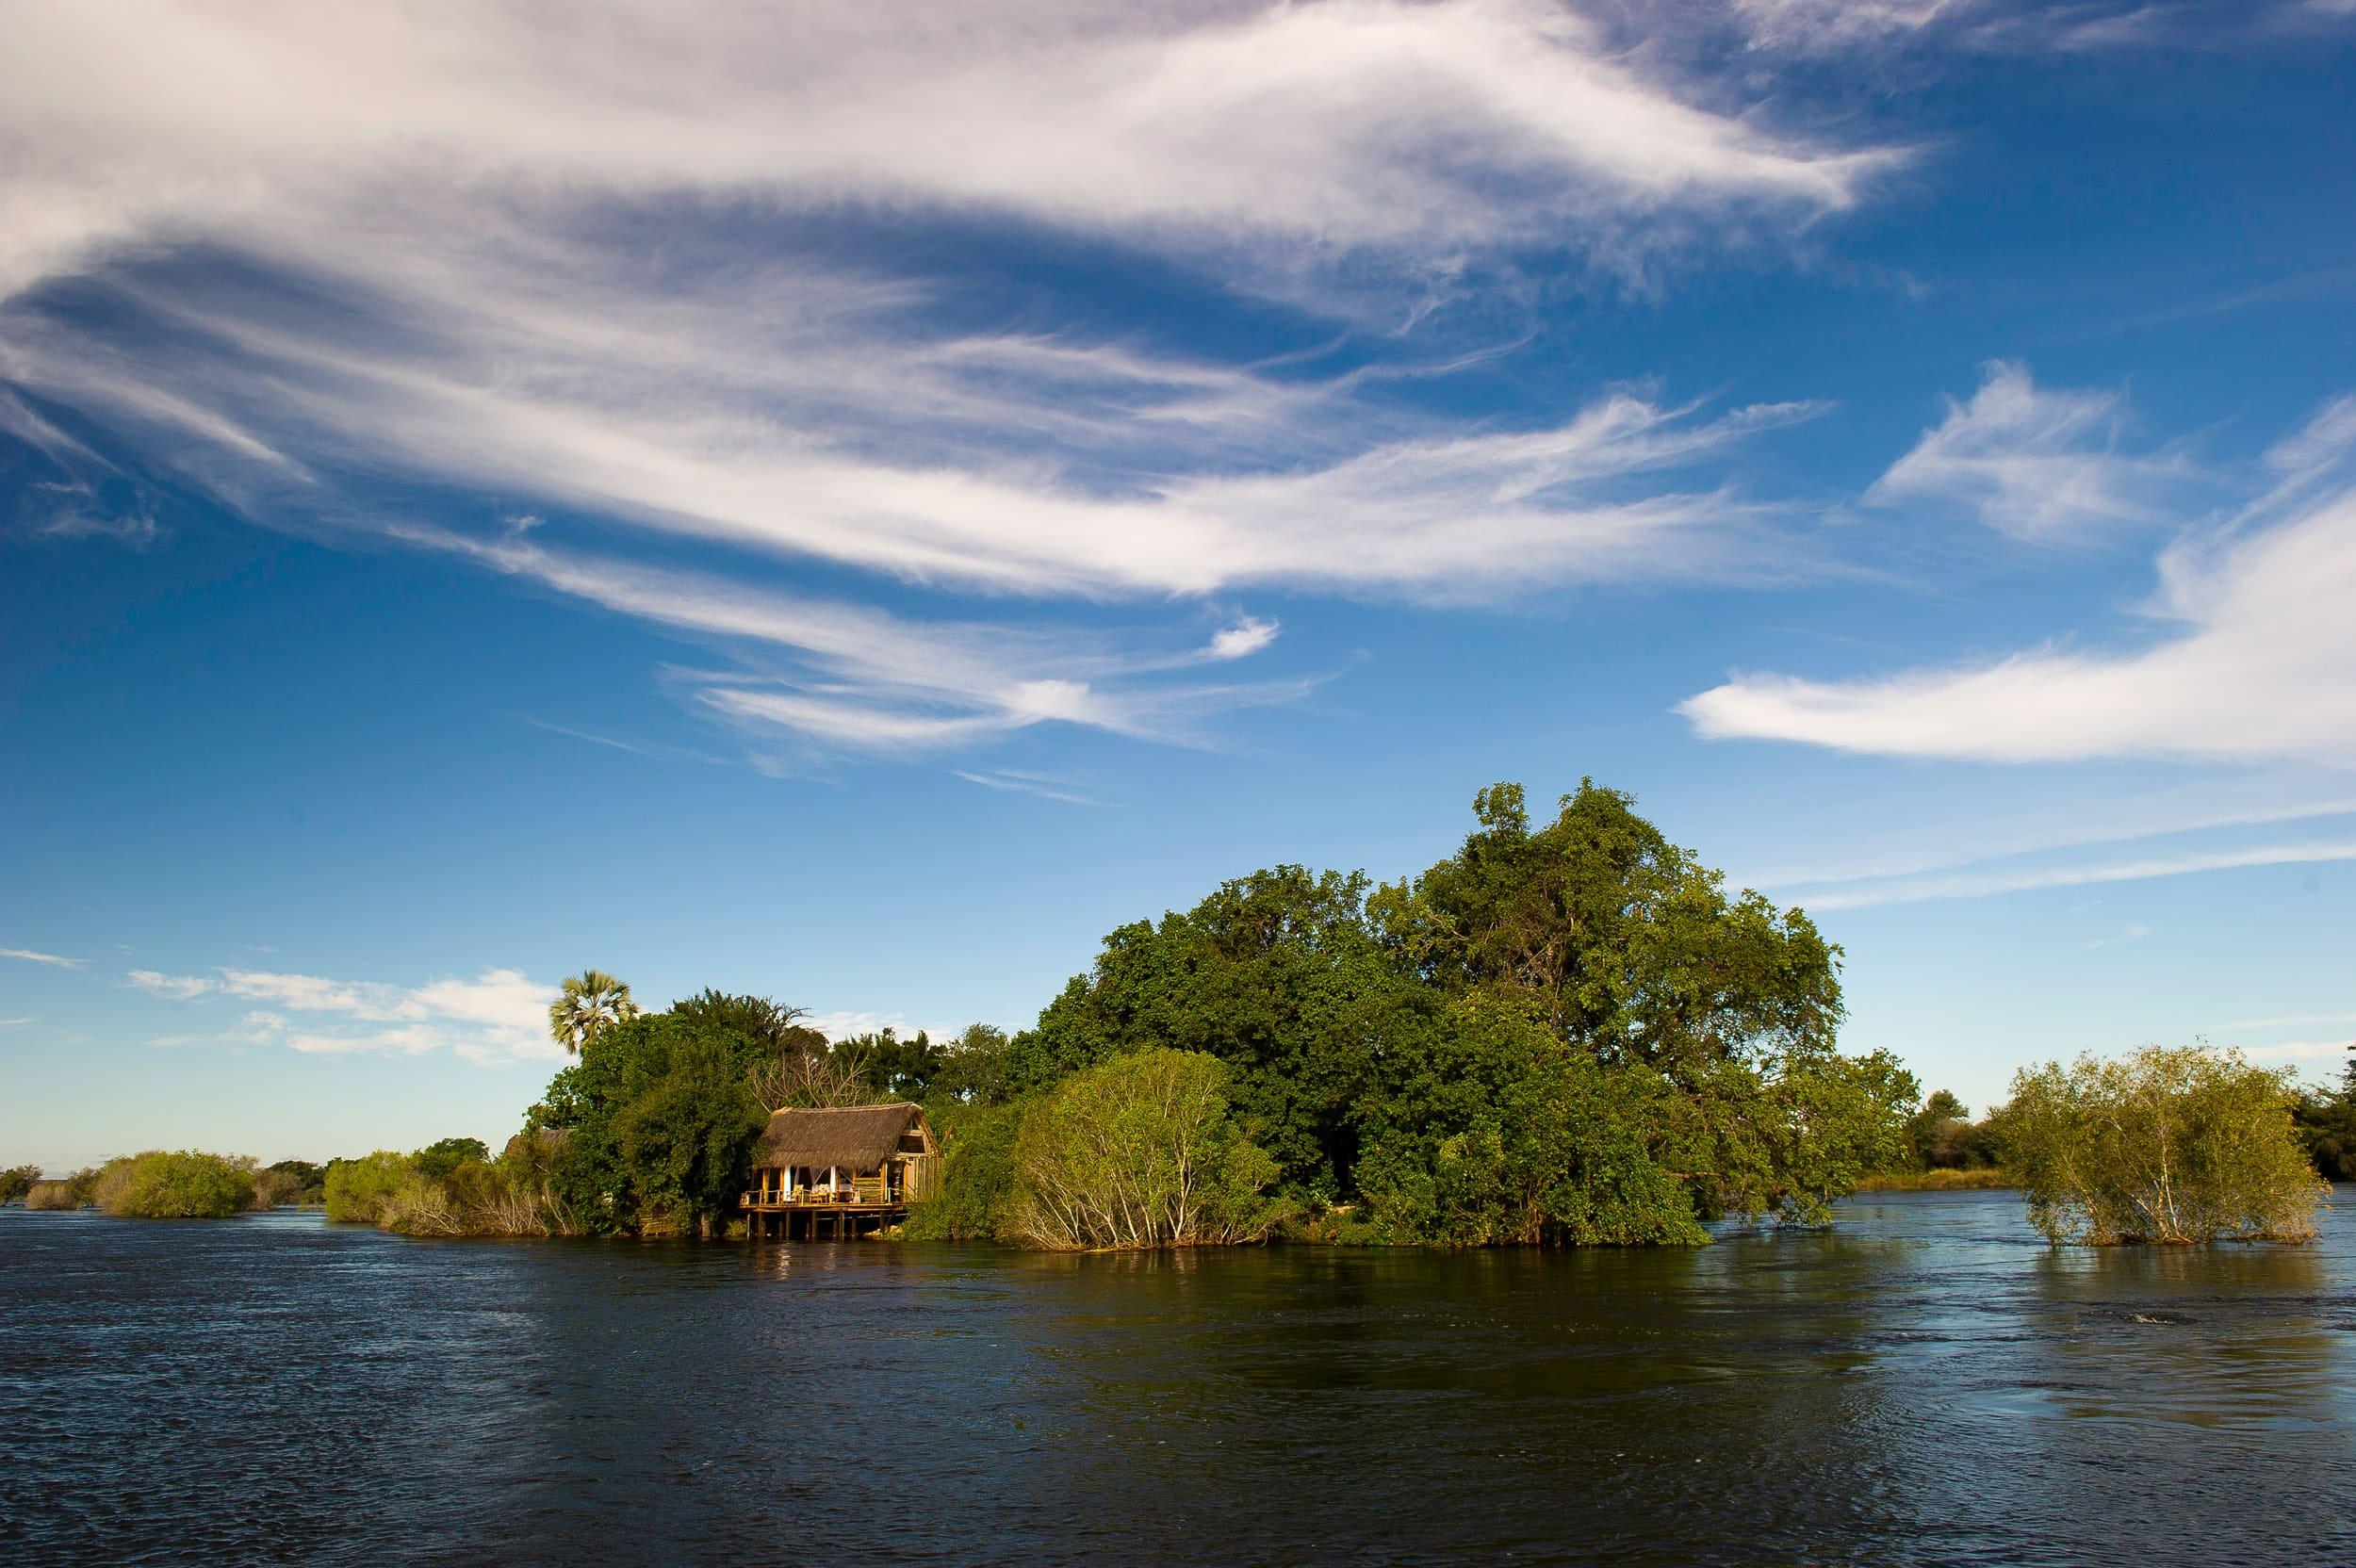 Africa,Botswana,Victoria Falls, Alojamiento, Sindabezi Island Lodge,rio,isla